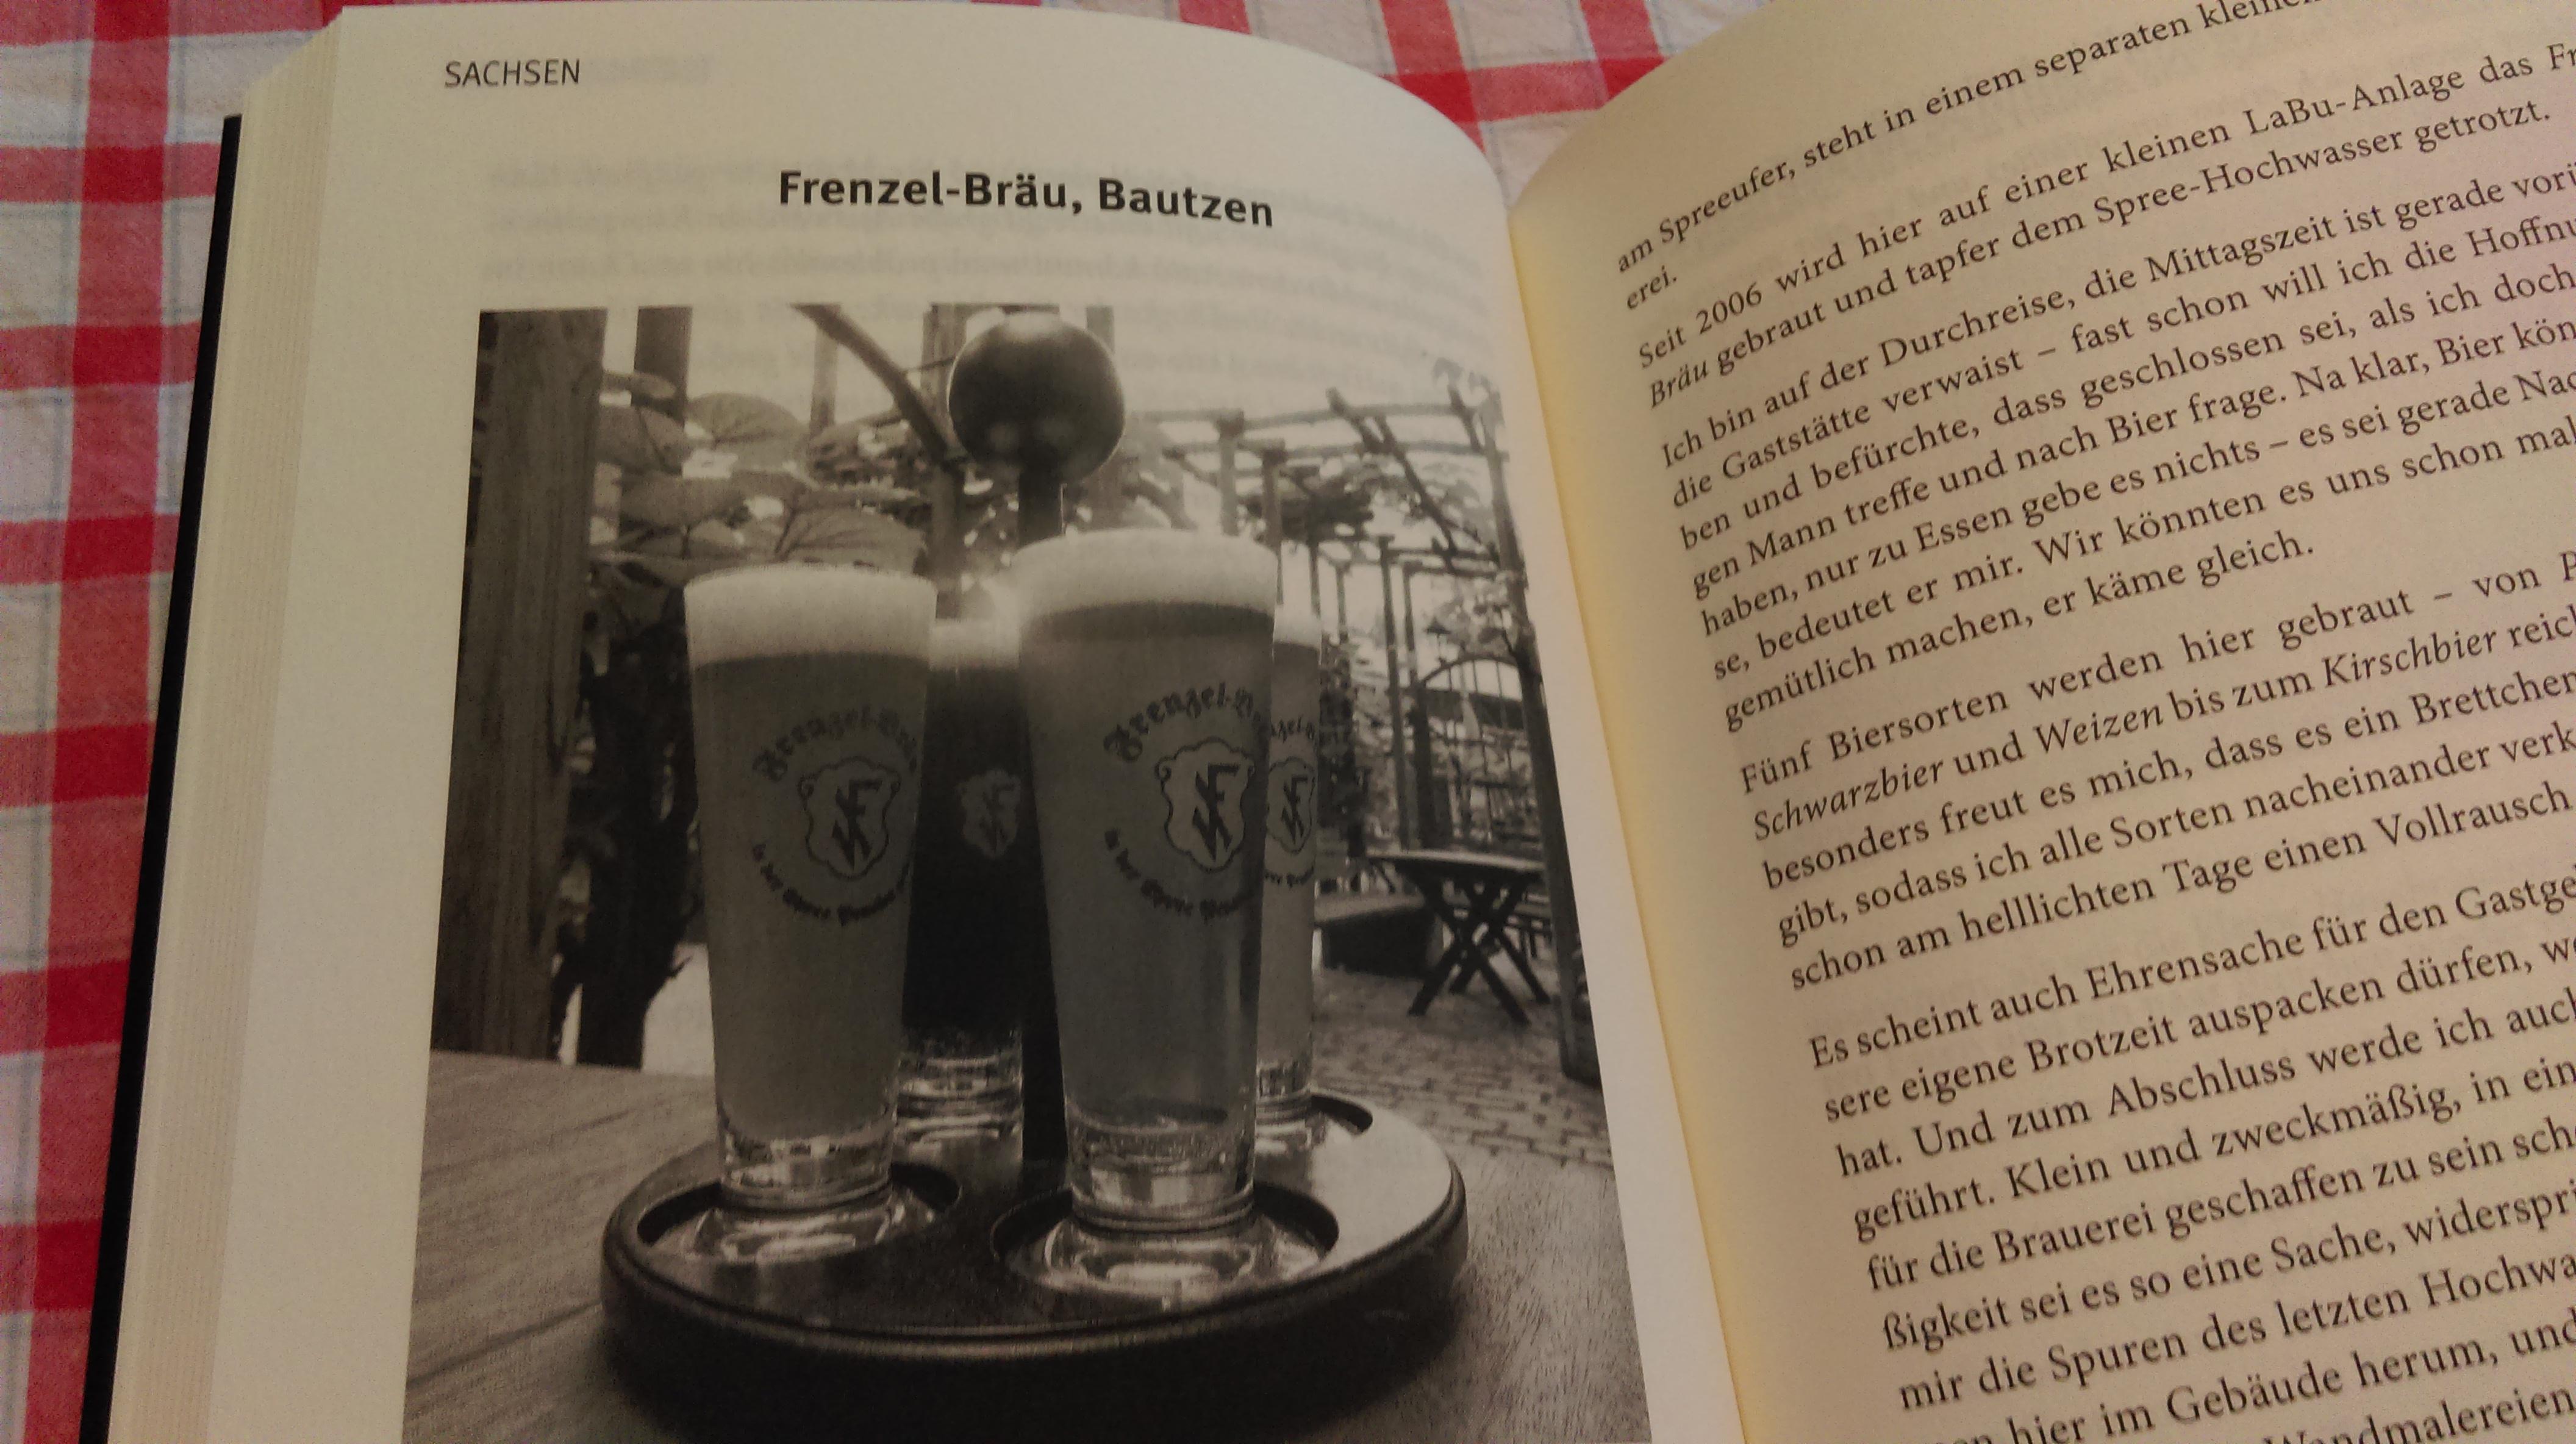 Bier&Buch: Volker Quante: Bier vor Ort – Bier-Scout